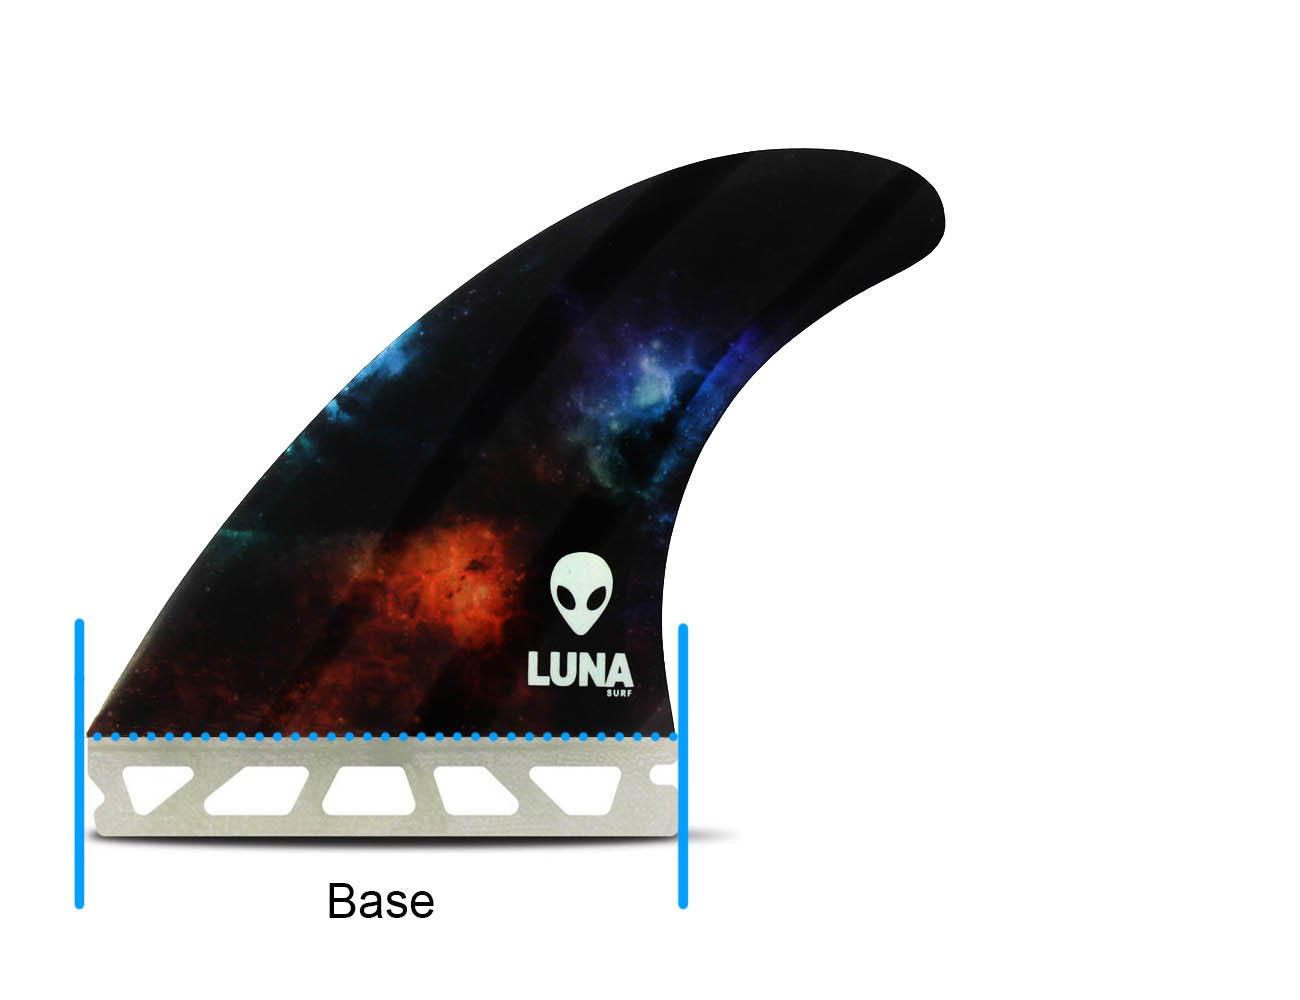 surfboard fins explained base